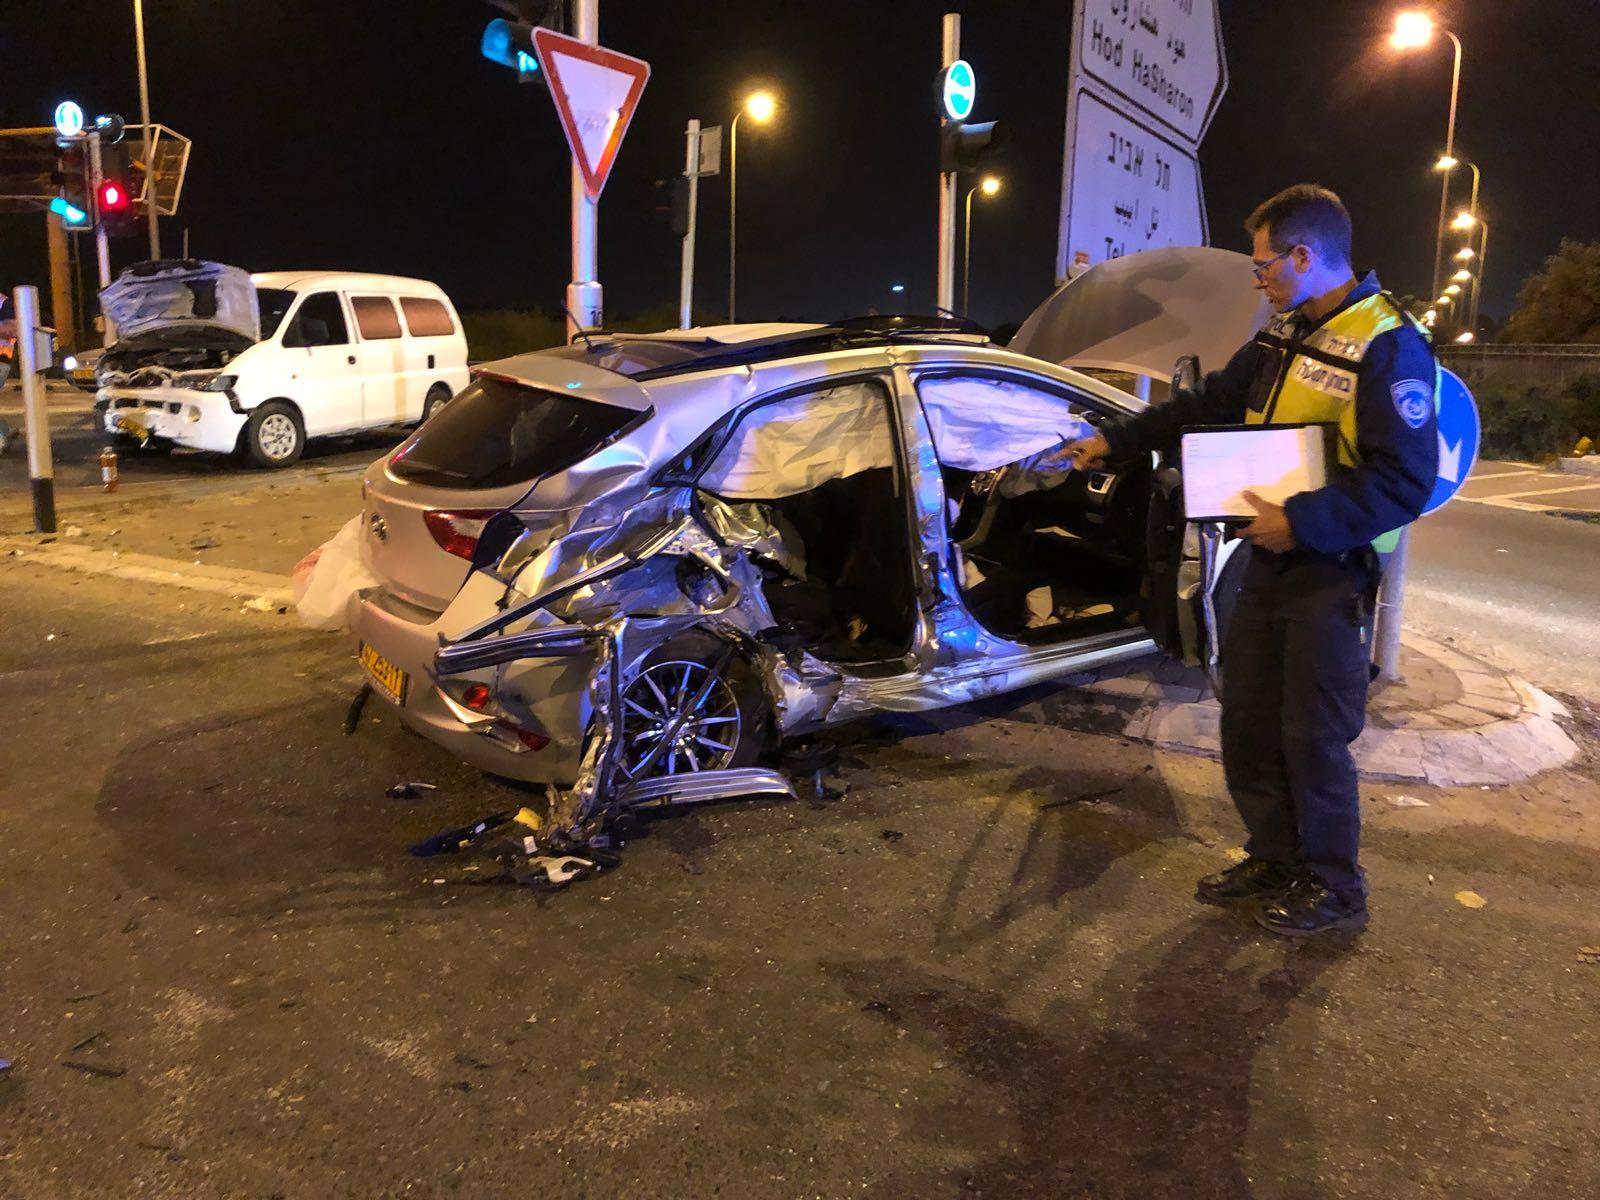 Photo of תאונה קטלנית שנייה הלילה בכביש 55 לידכפר סבא. צעירה בת 23 מכפר סבא